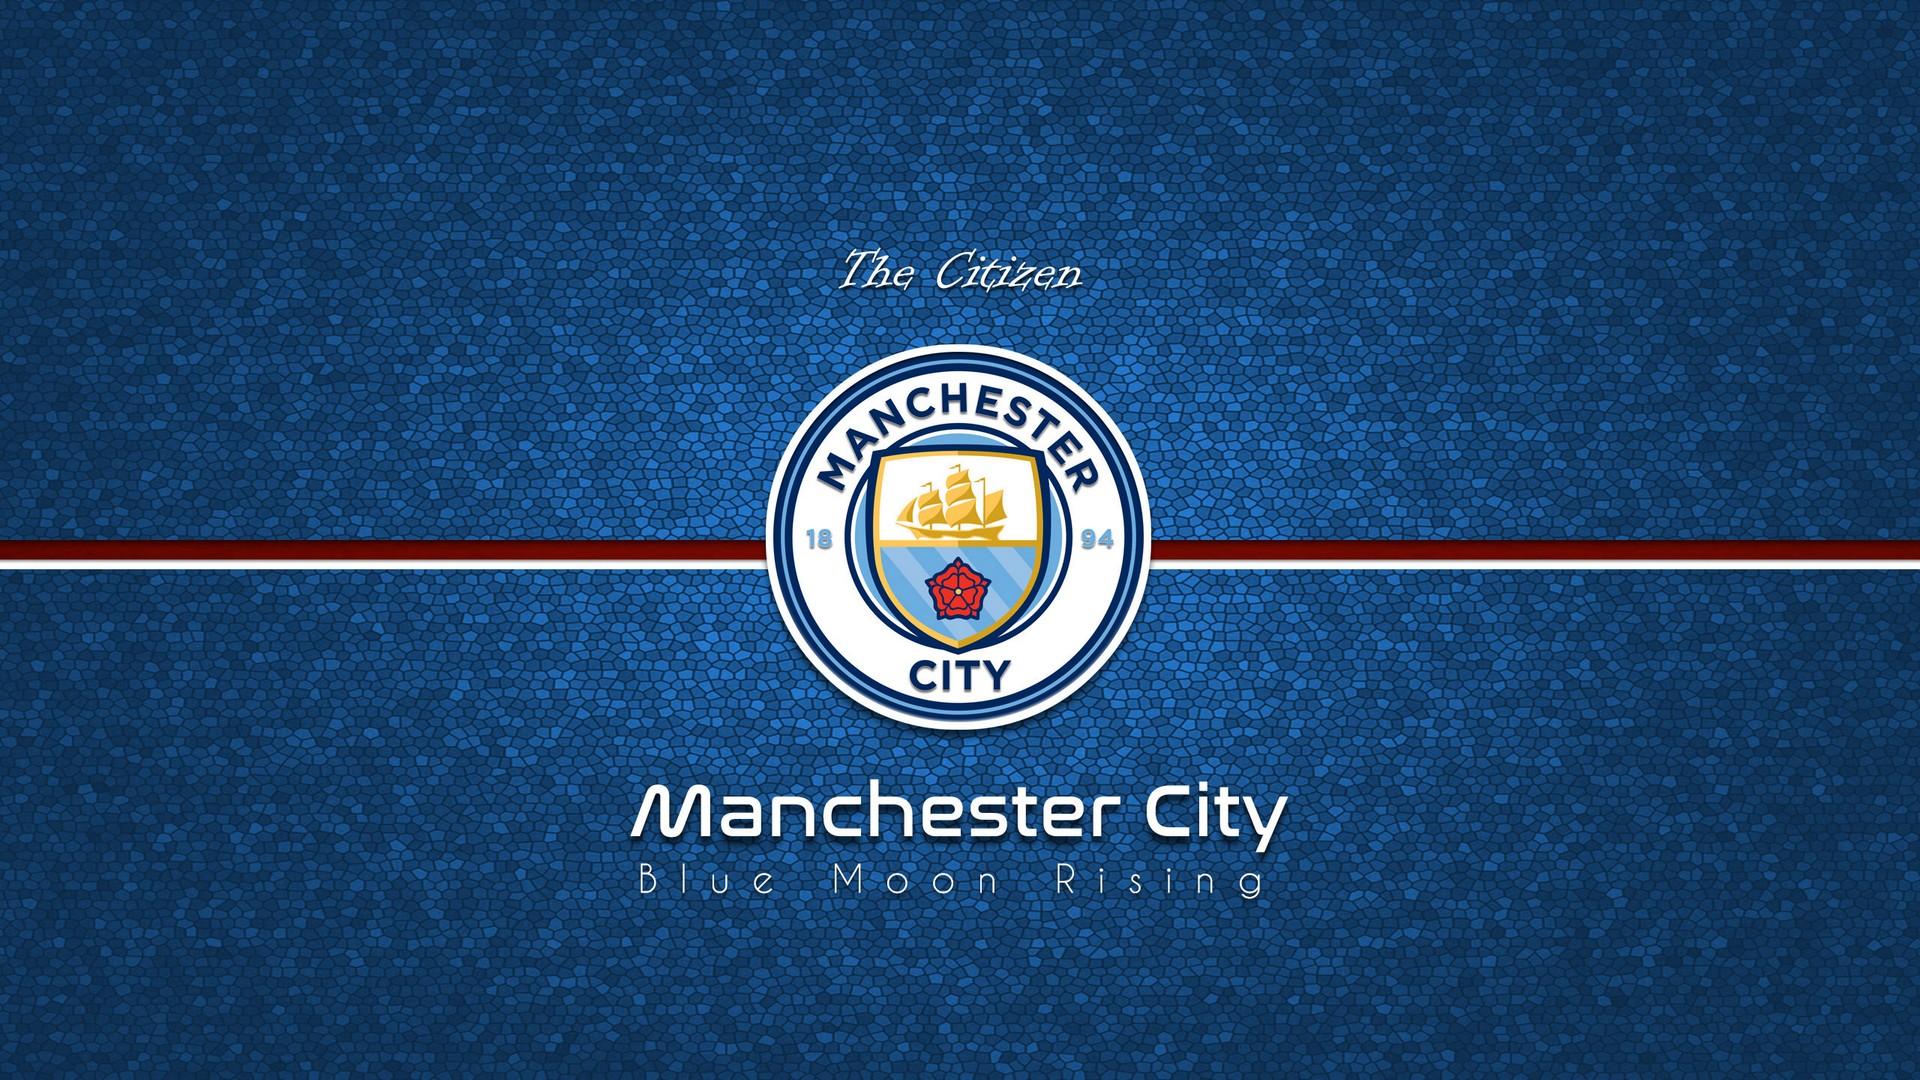 manchester city football club valueable club